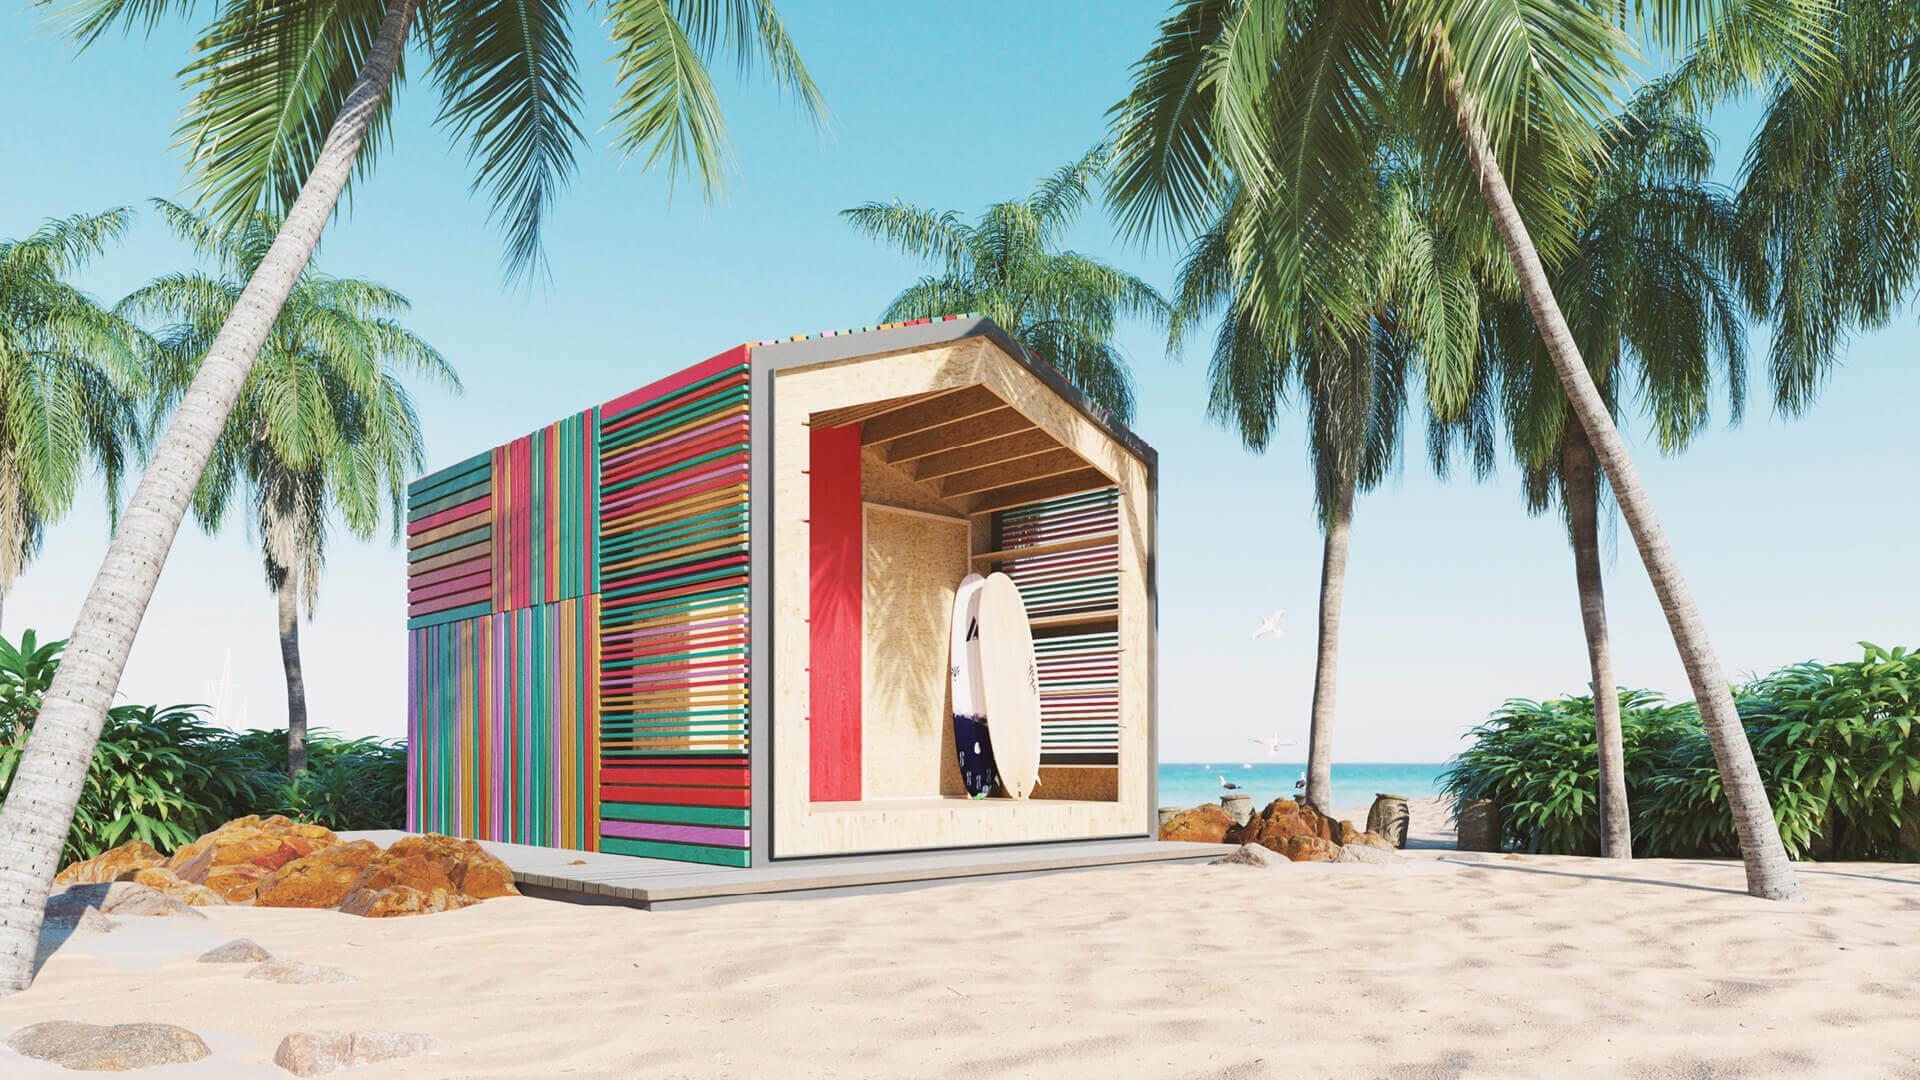 JaK Studio unveils modular cabins inspired by the popular online game Minecraft